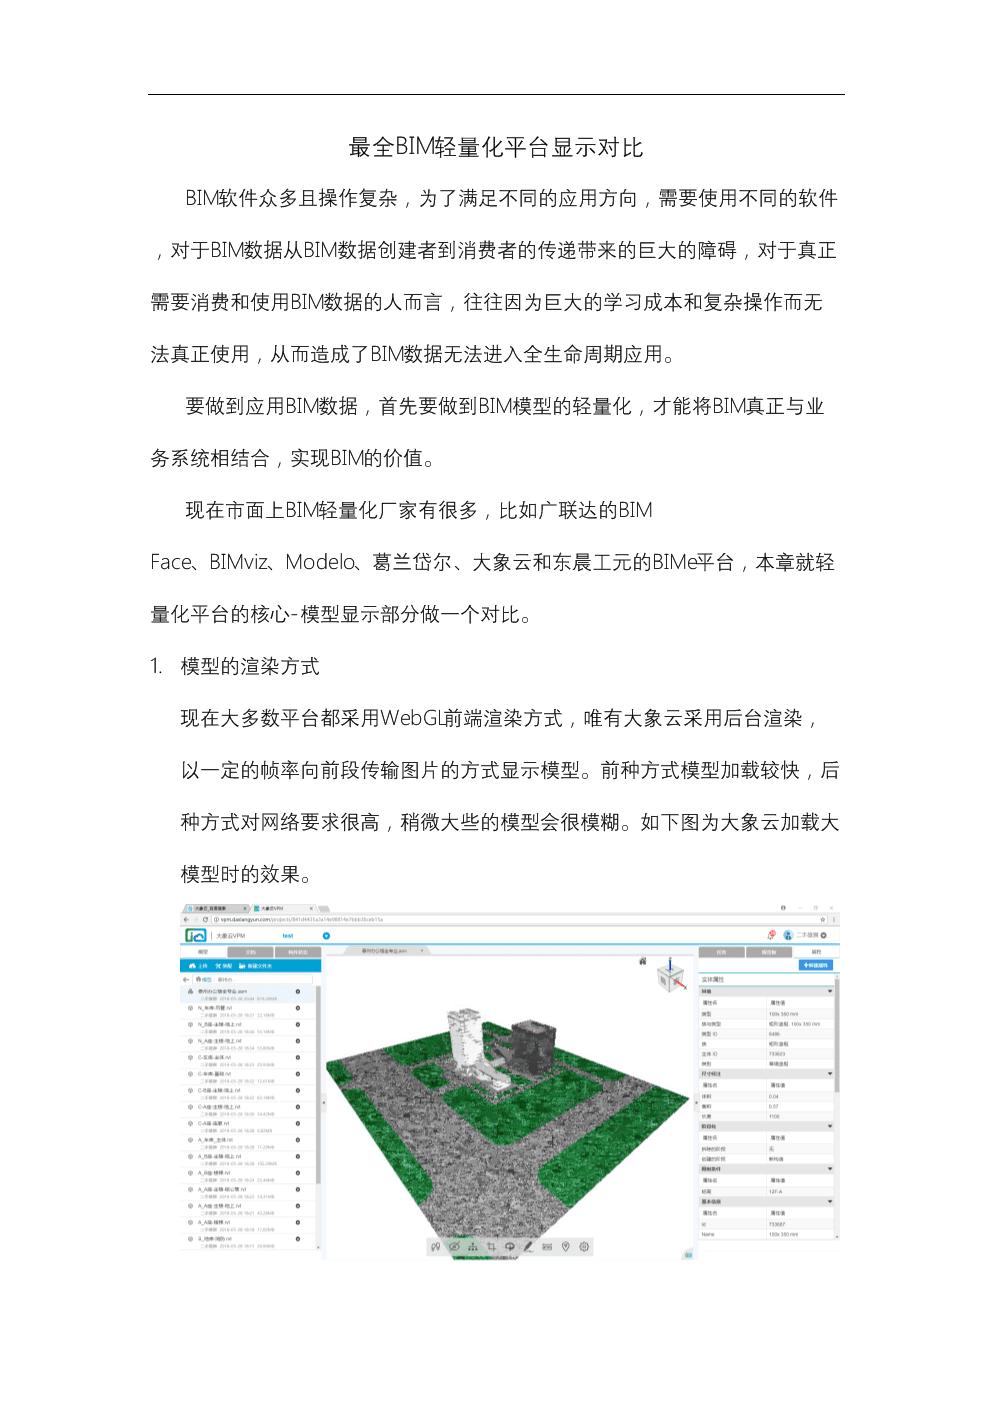 BIM平臺模型顯示測評分析.doc